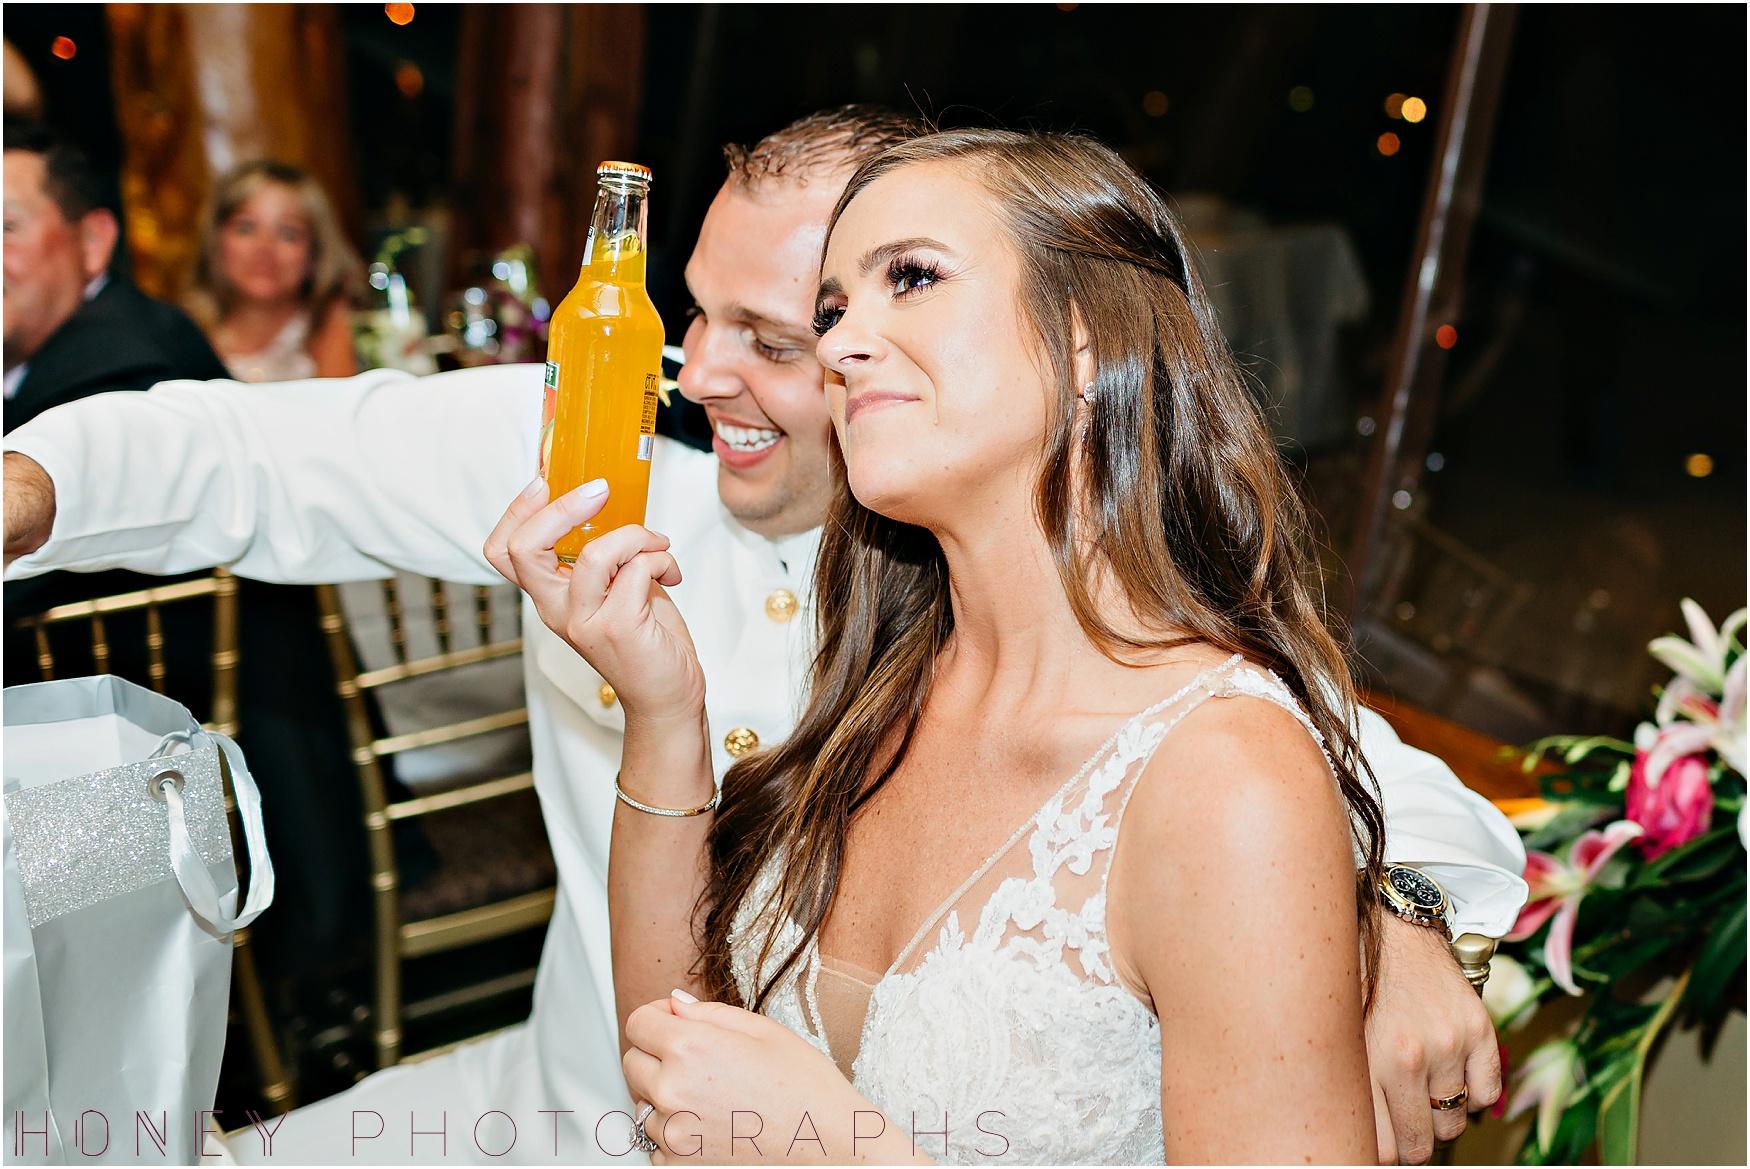 bali-hai-tropical-bubble-exit-party-paradise-wedding062.jpg